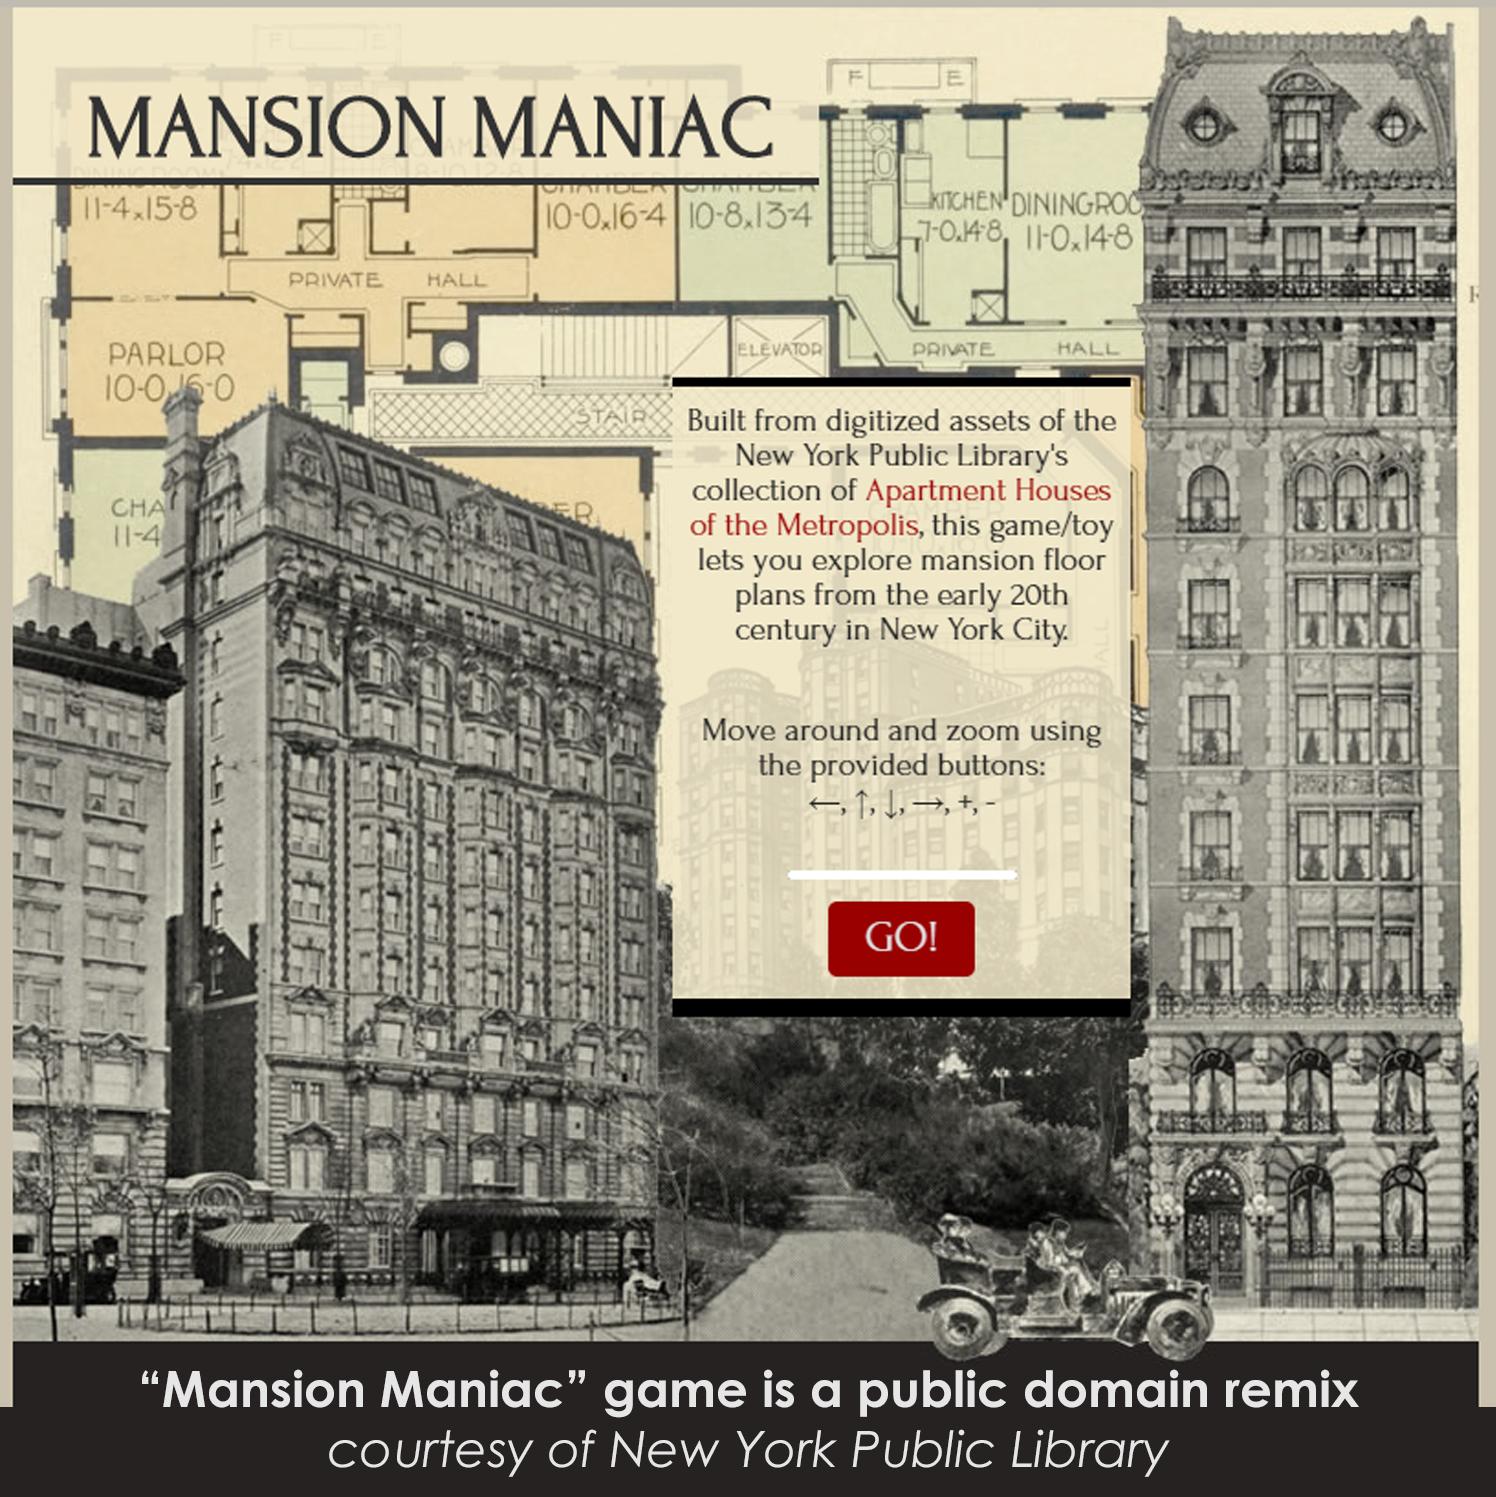 New York Public Library Mansion Maniac public domain remix game